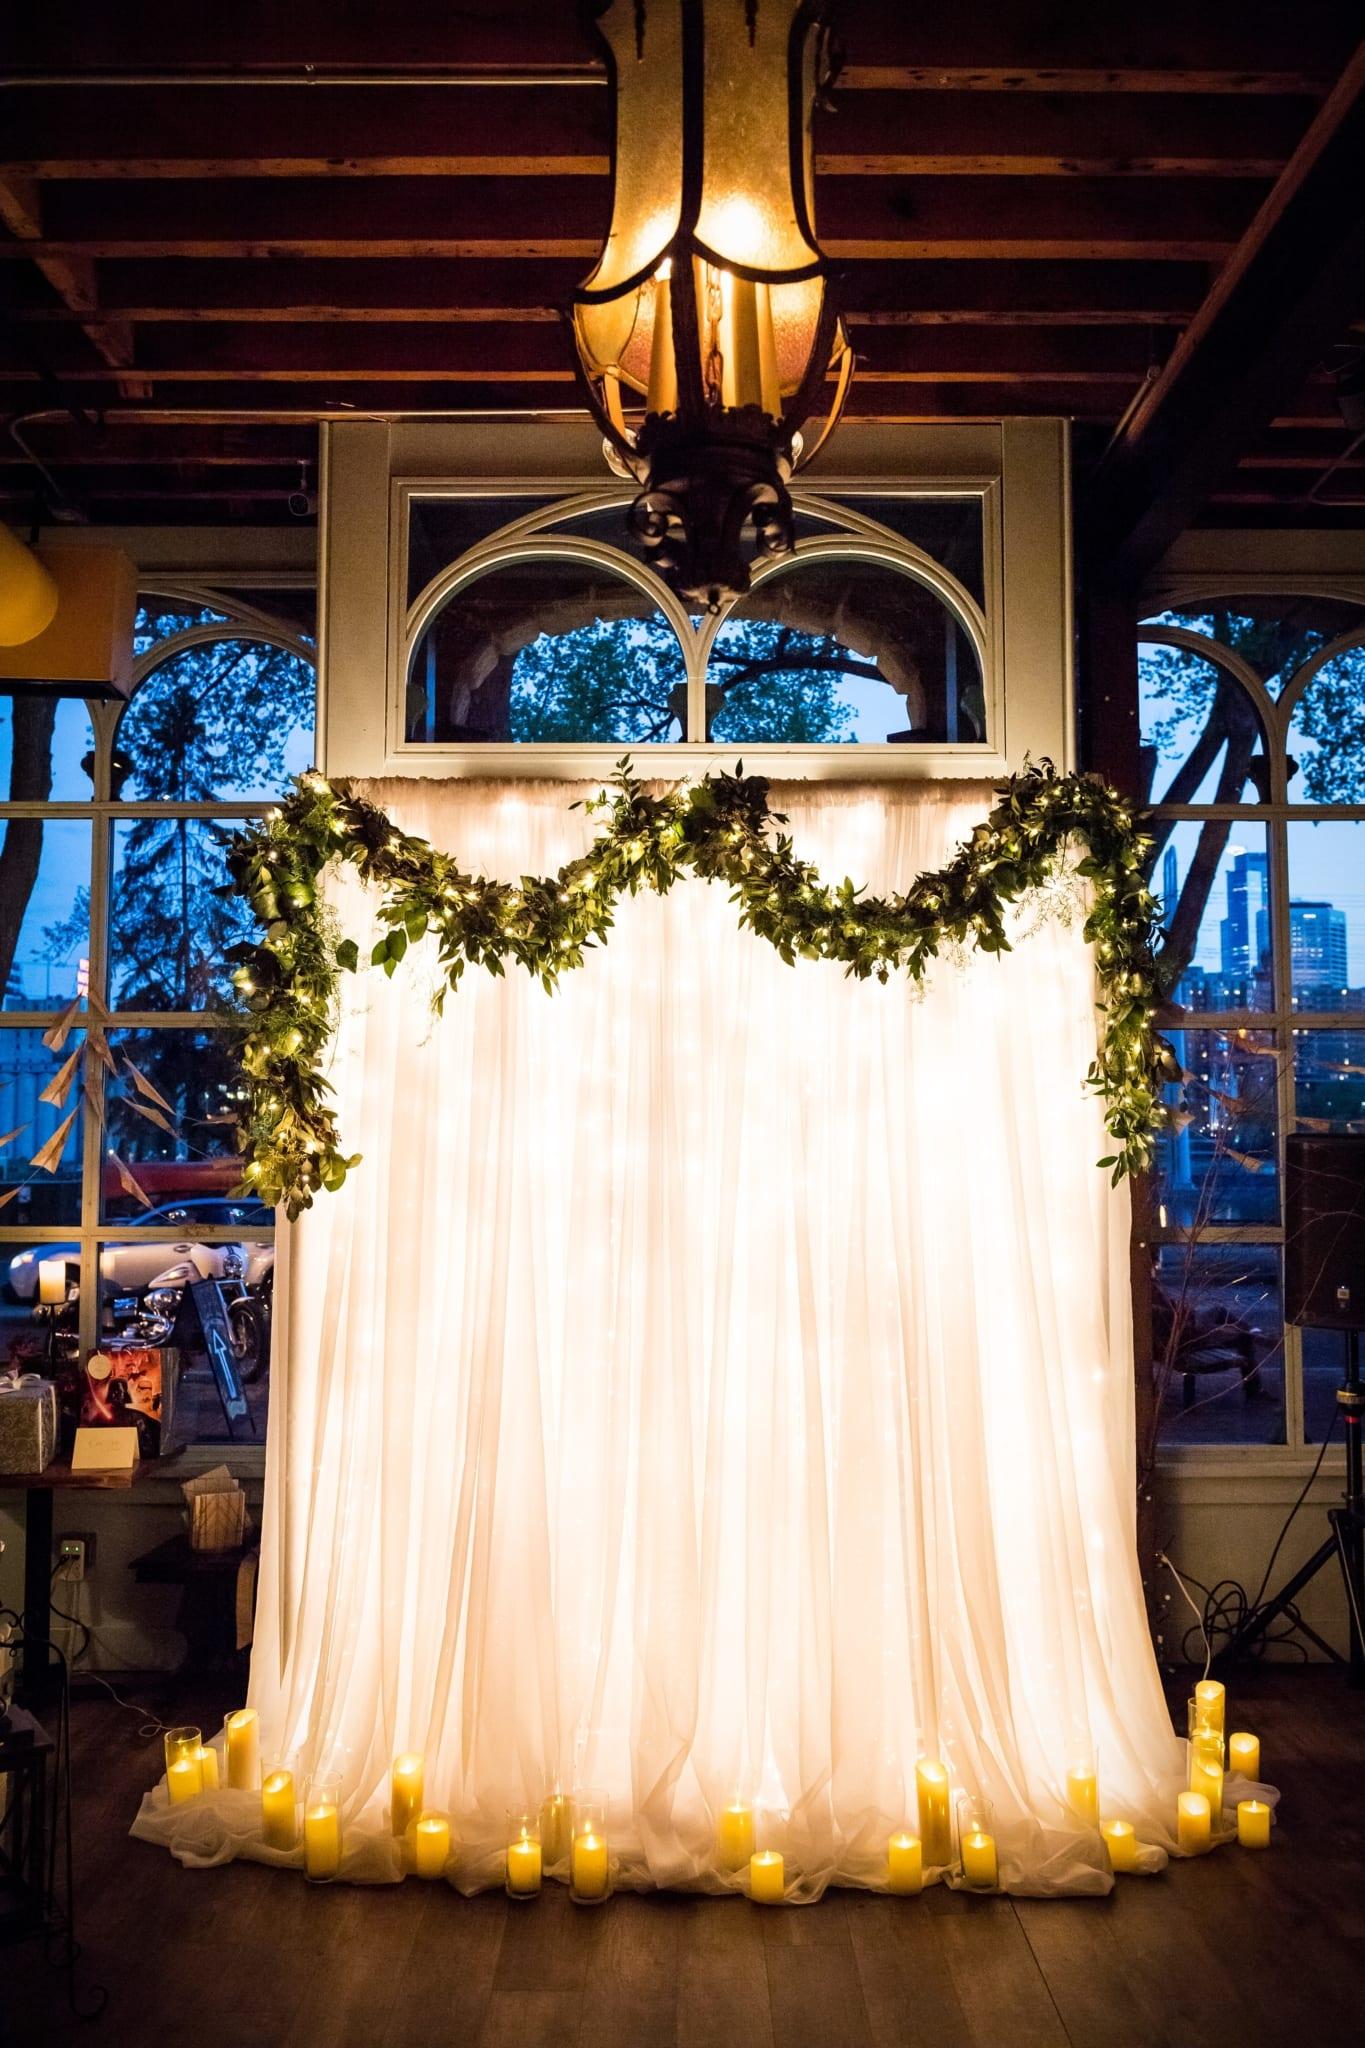 Star Wars wedding, A Frame Forward Photography, wedding inspiration, Aster Cafe, Minneapolis wedding, wedding flowers, wedding floral, wedding details, Artemisia Studios, Minneapolis wedding florist, Minnesota wedding florist